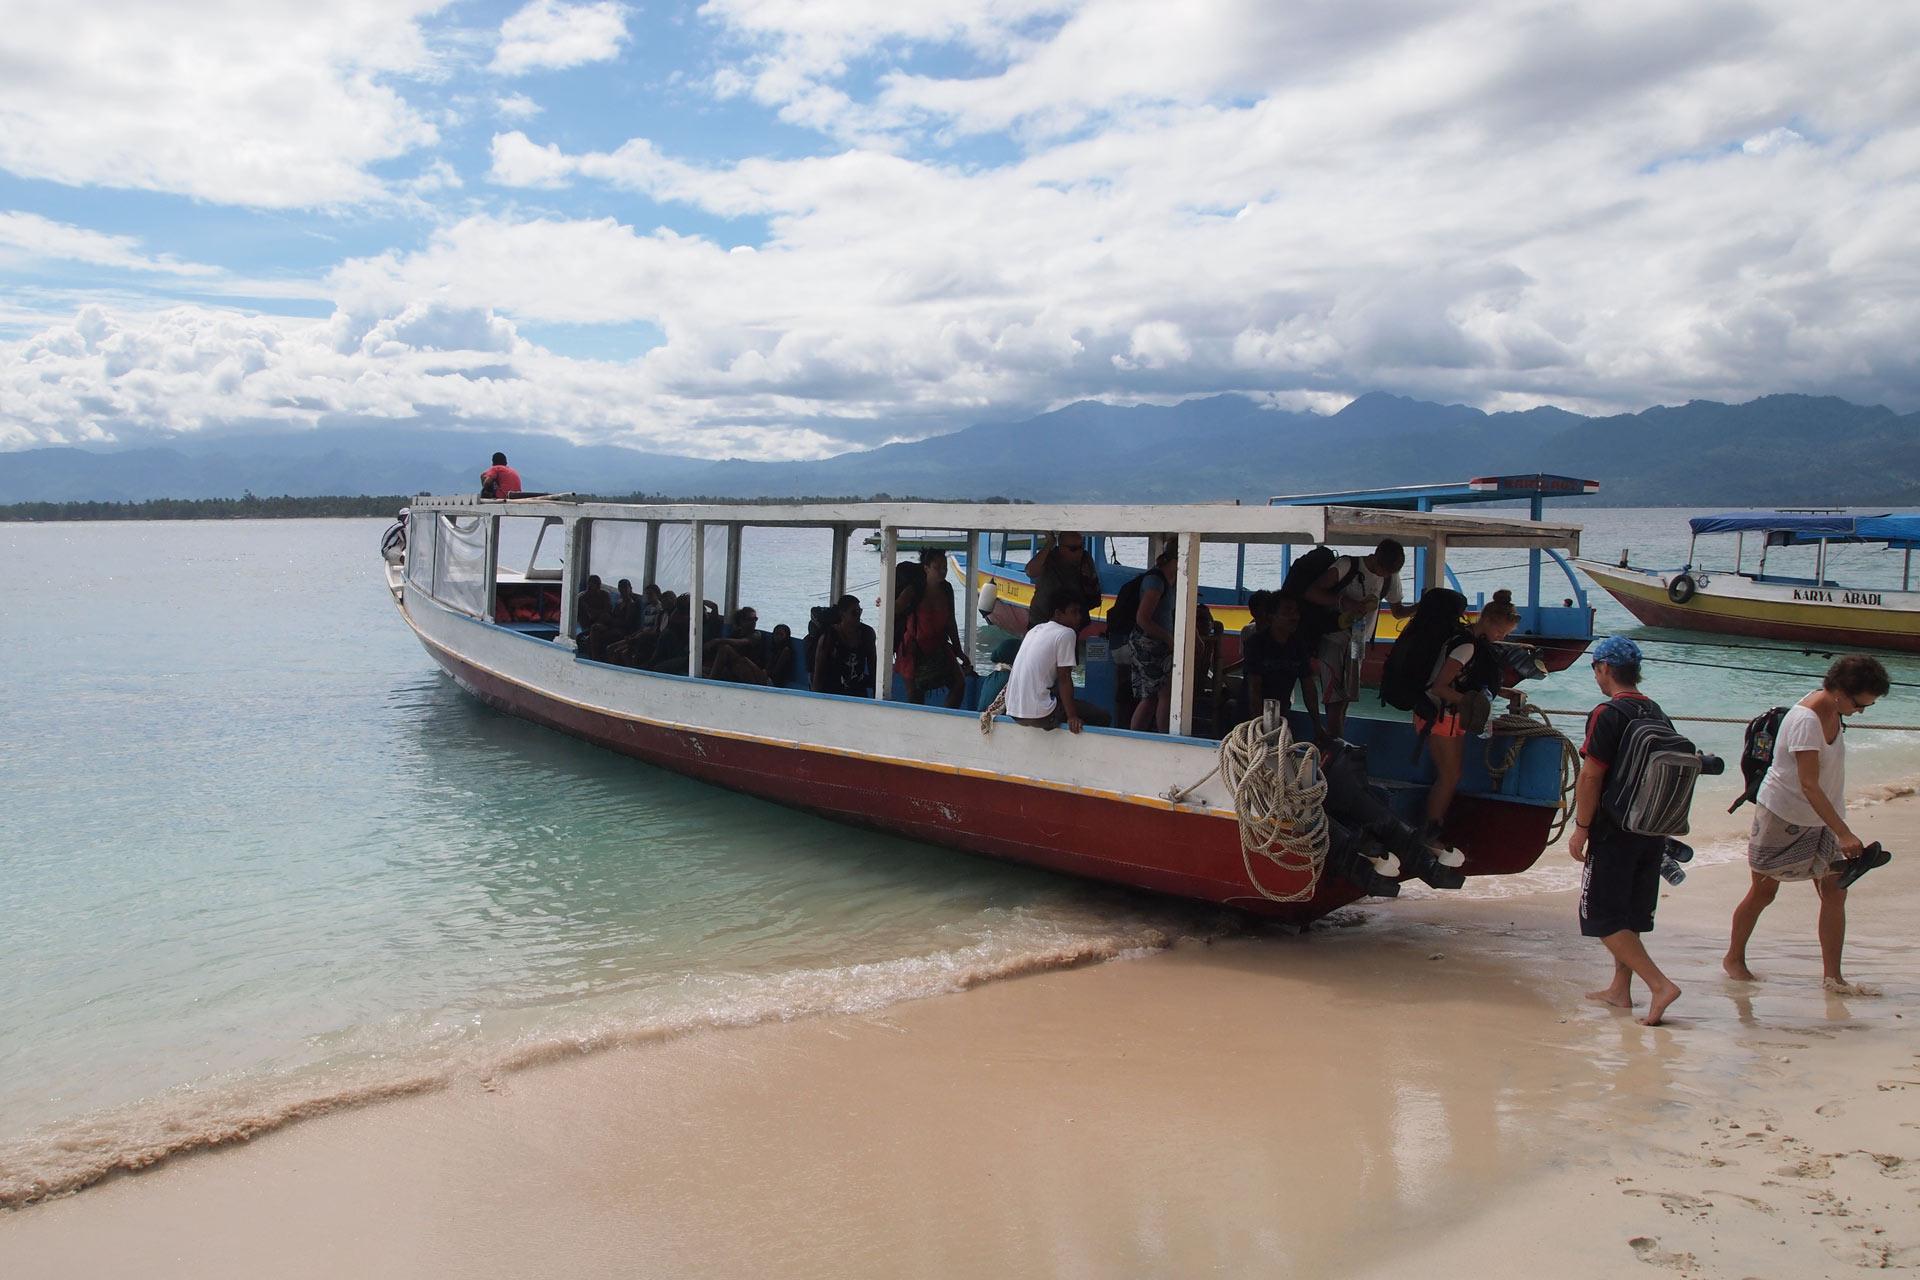 Лодка с Ломбока до островов Гили